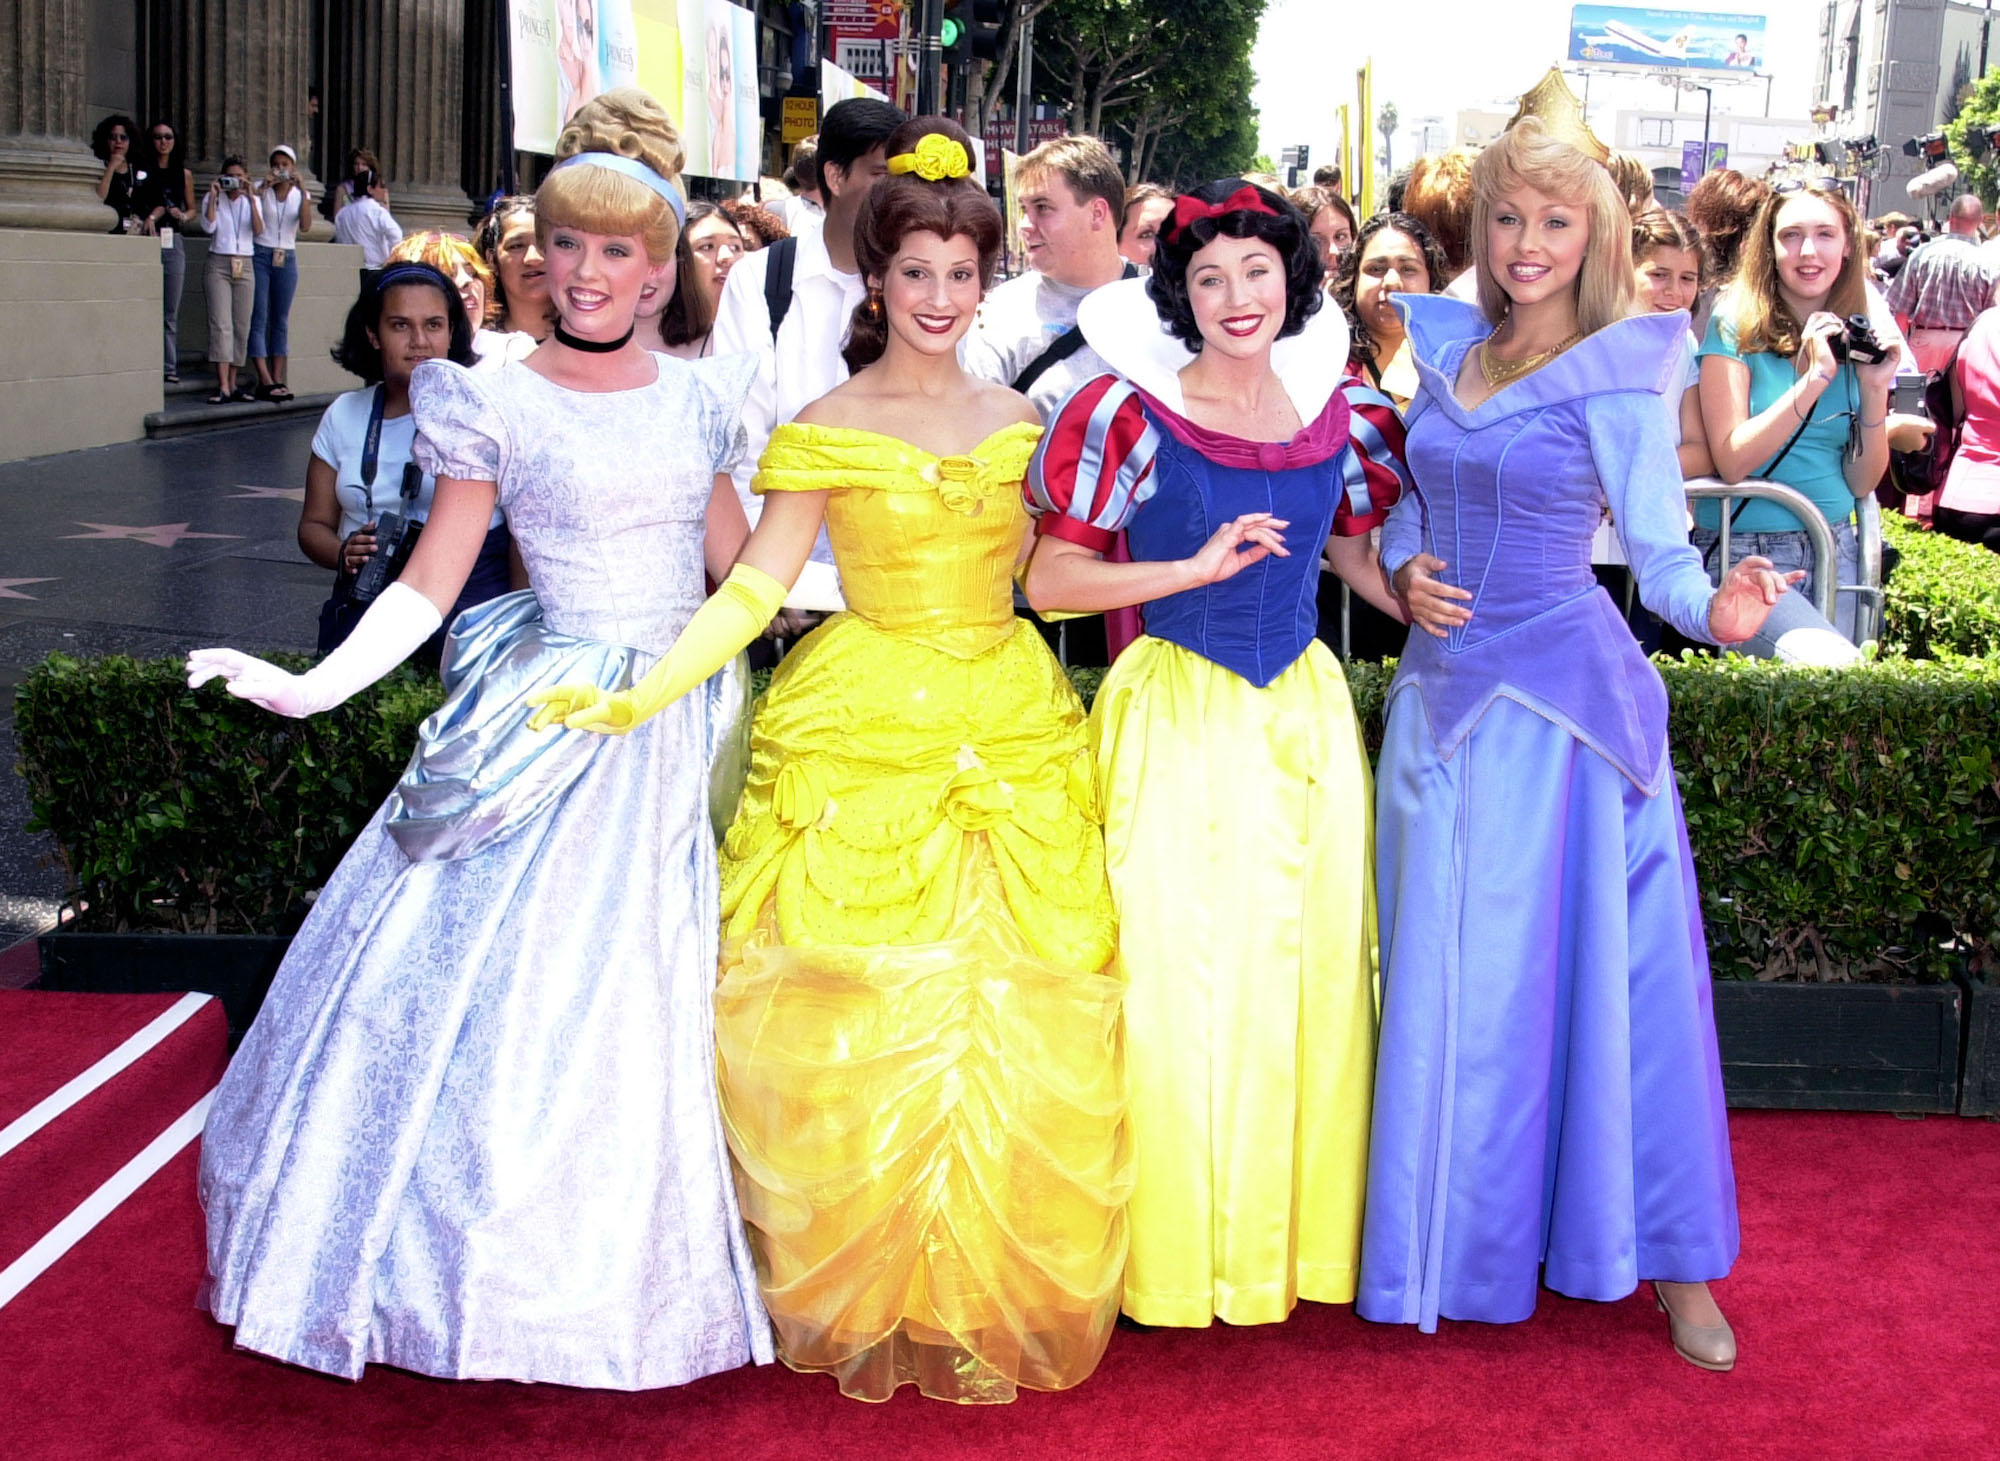 Disney princesses at 'The Princess Diaries' Premiere at El Capitan Theatre on July 29, 2001